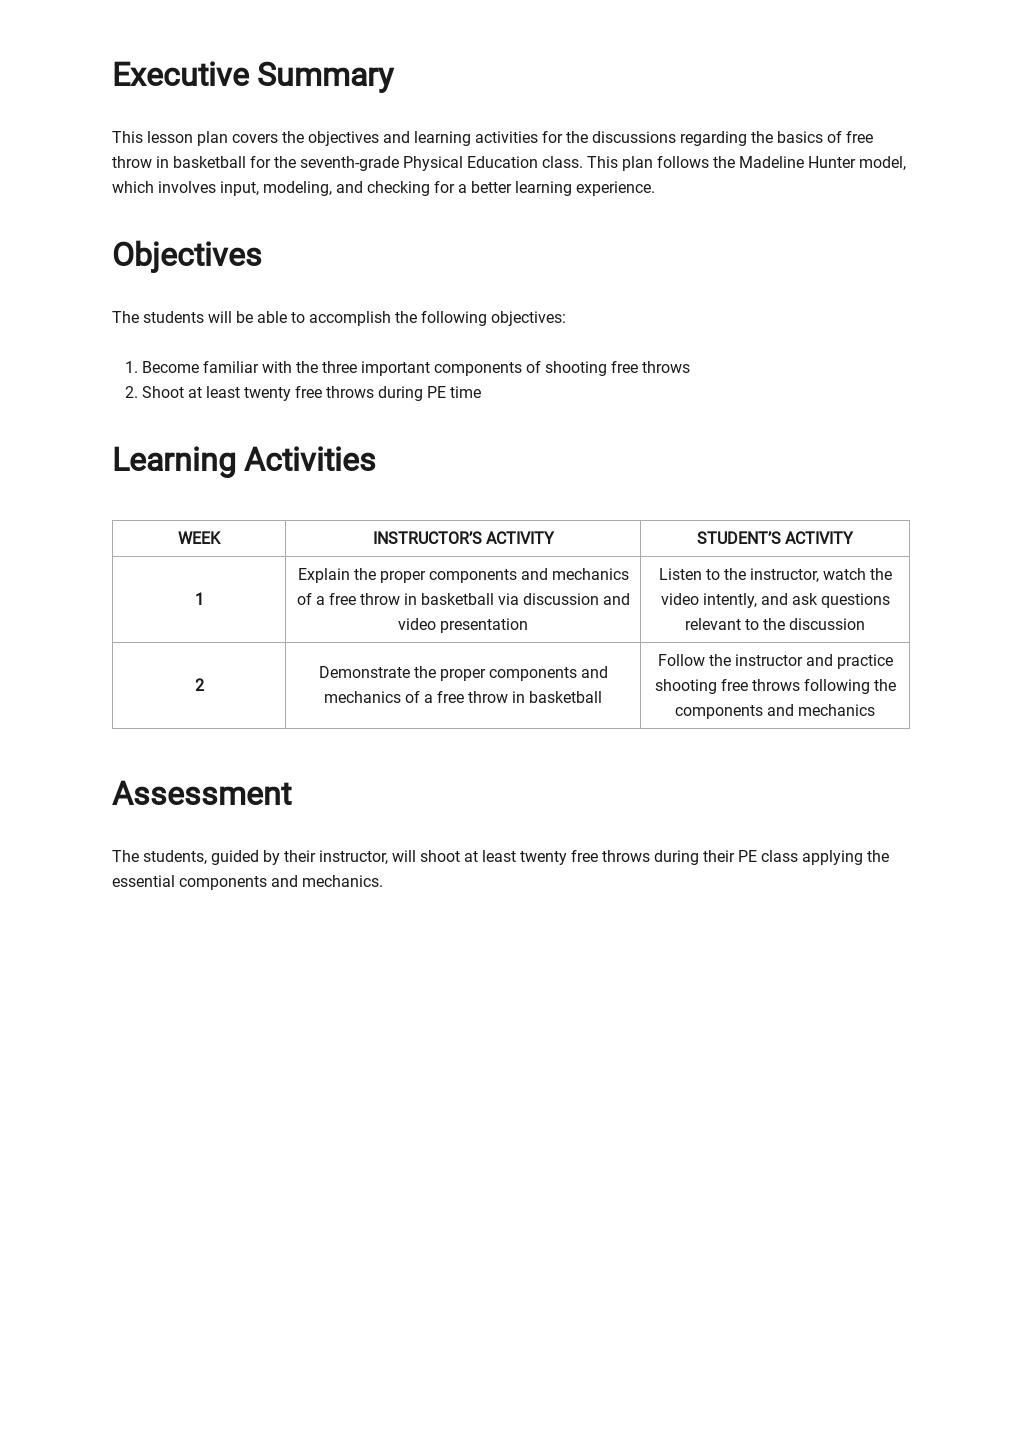 Blank Madeline Hunter Lesson Plan Template 1.jpe